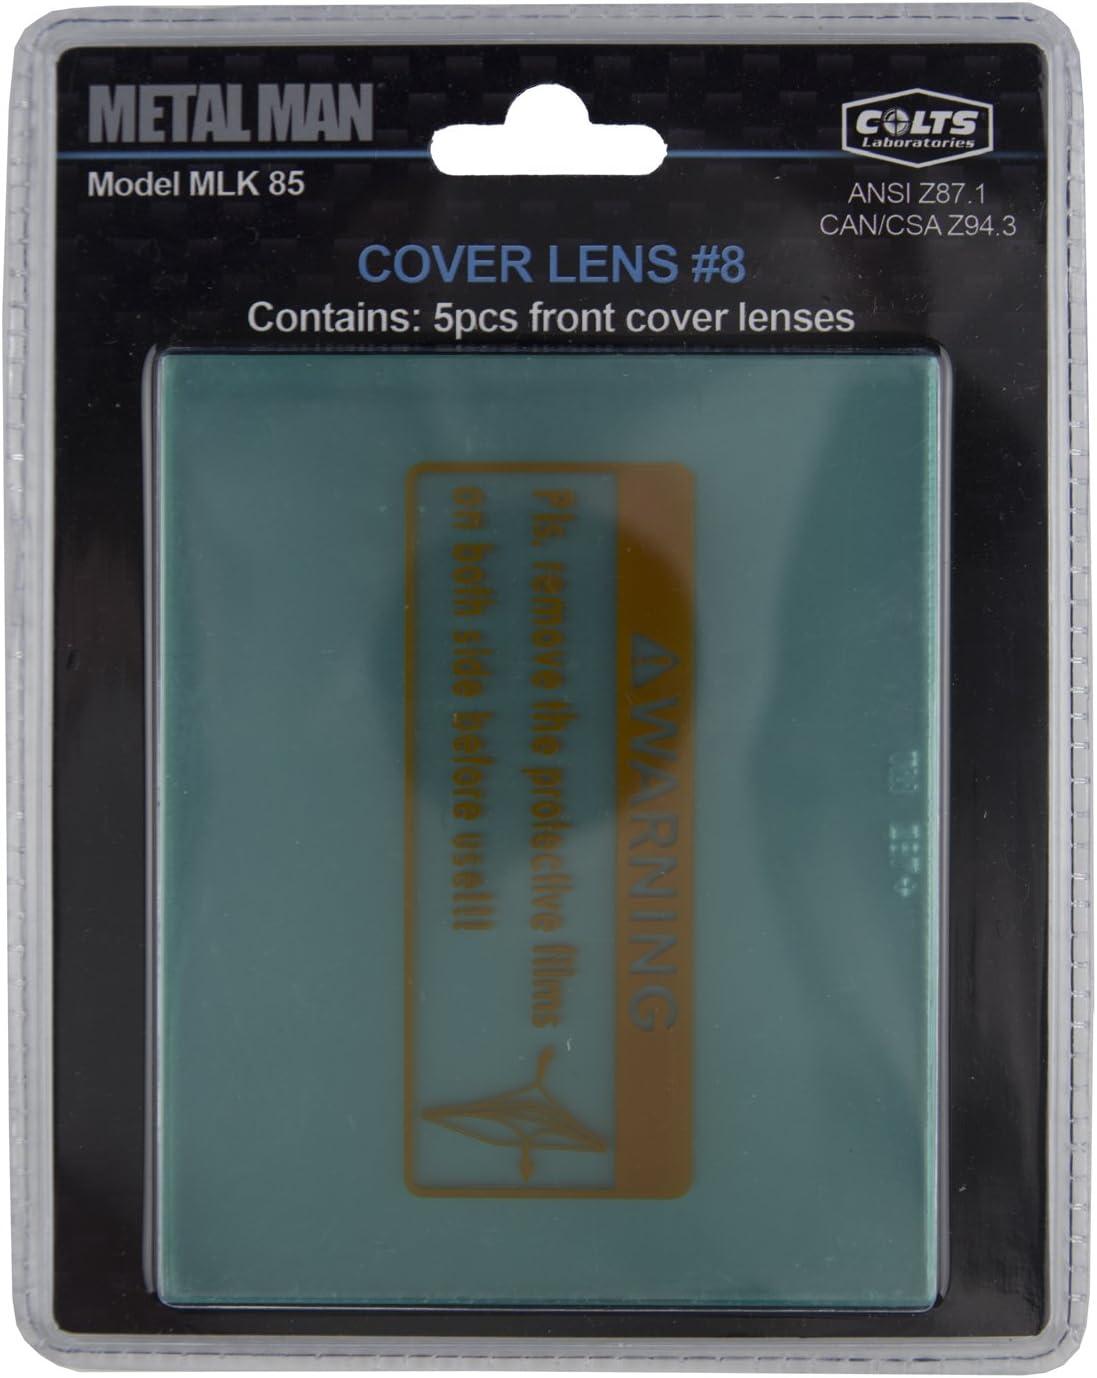 MLK85 Metal Man Front Cover Lens Package #8-5 pack protective front cover lens for Metal Man Brand 8000 series welding helmets